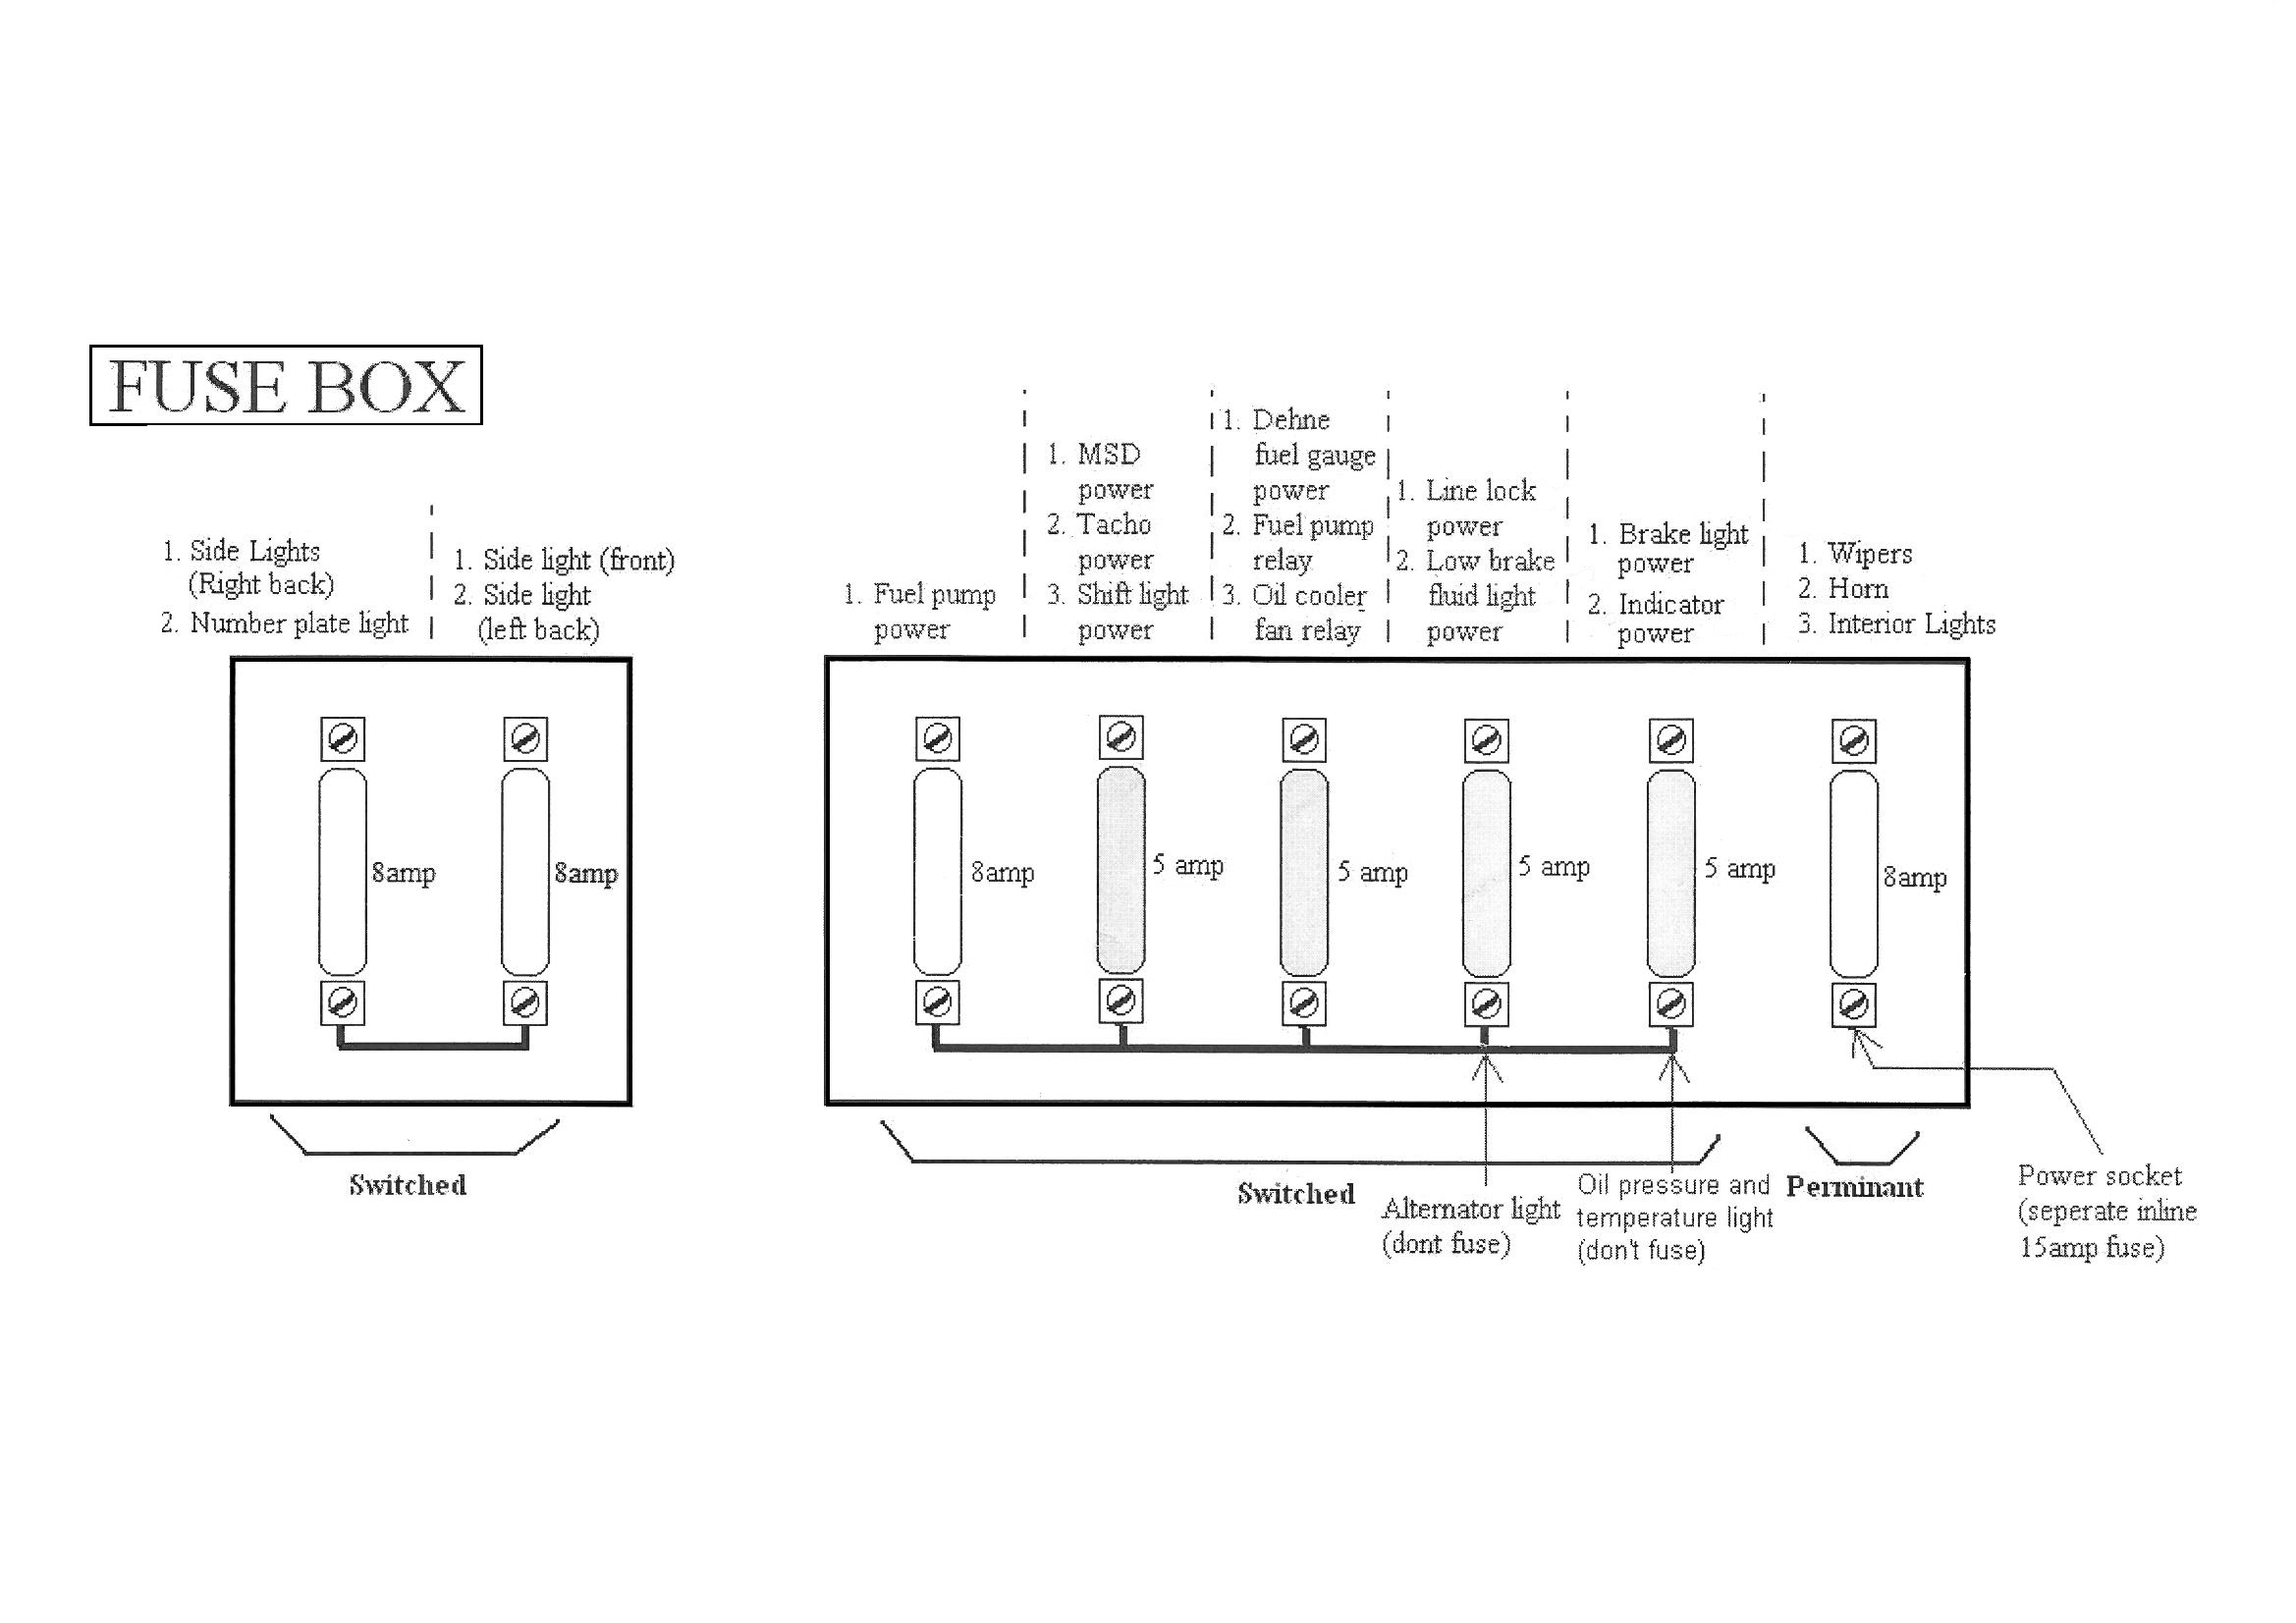 fusebox?resize\\\=665%2C470 code 3 360hl wiring diagram code3 \u2022 wiring diagrams j squared co code 3 excalibur wiring diagram at soozxer.org